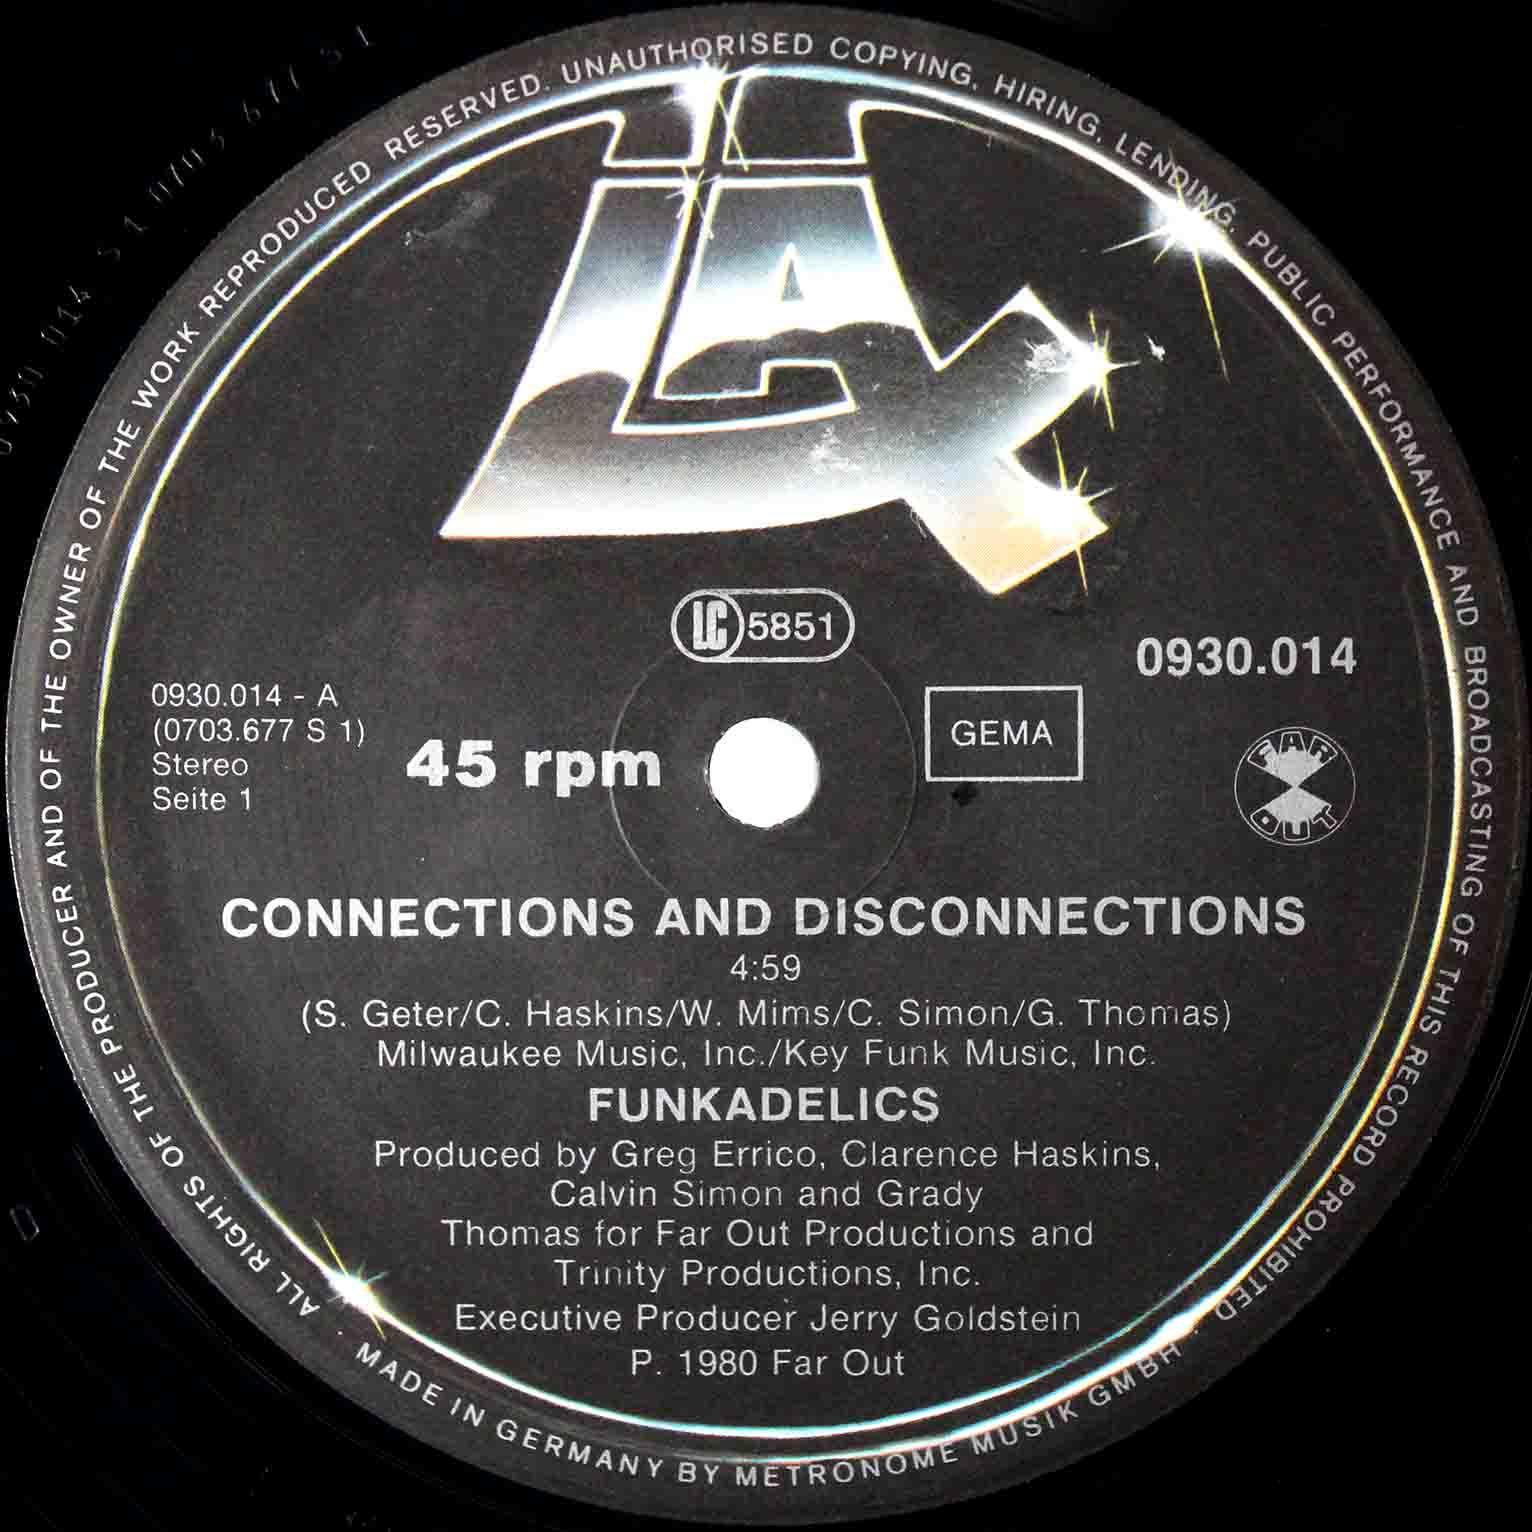 Funkadelics - Youll Like It Too 03